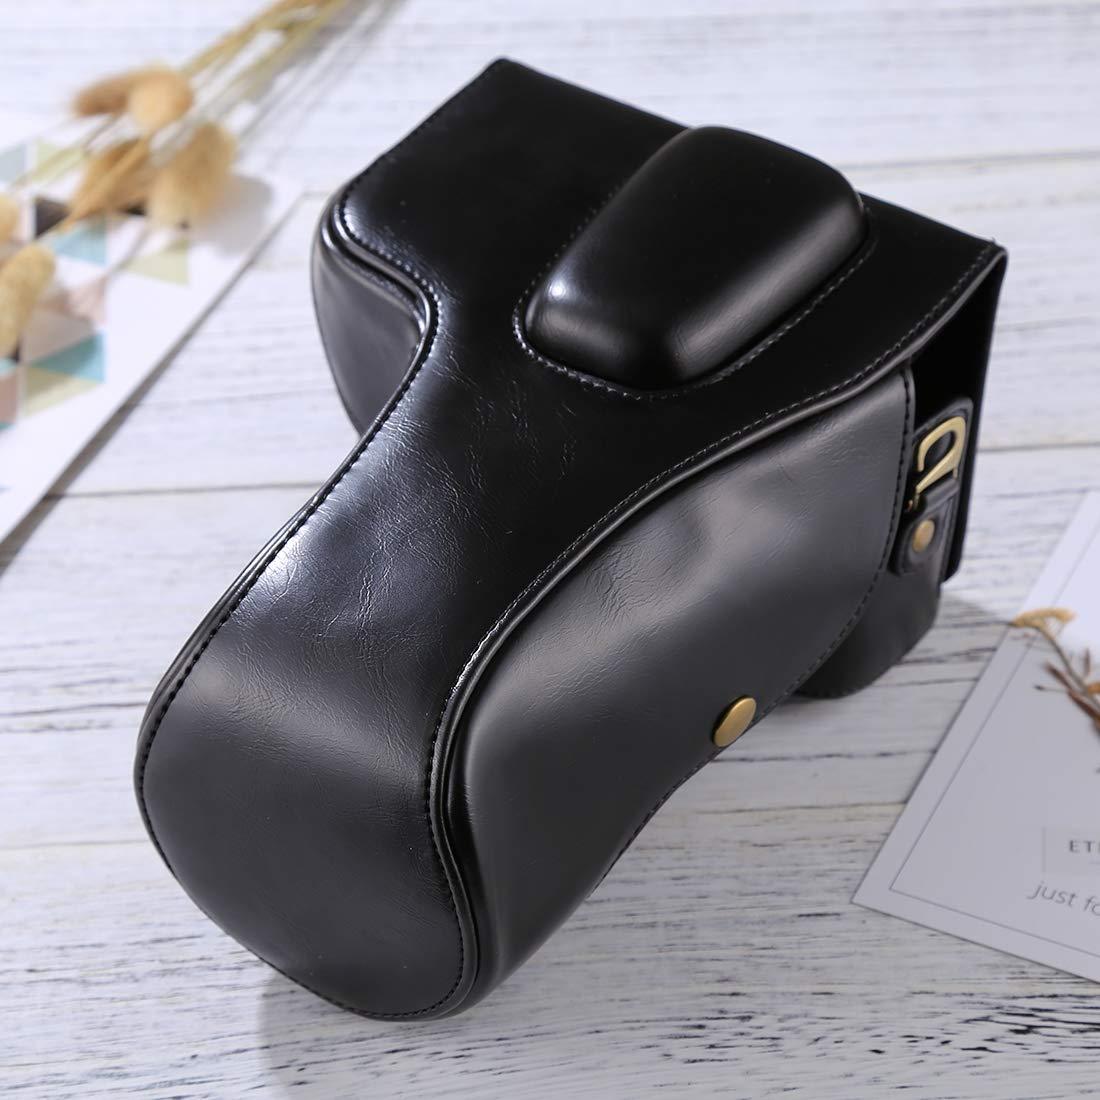 Diffomatealliance Bag,case&Straps Nikon D5300 / D5200 / D5100用GuoBomate勝利バッグ、ケース、ストラップフルボディカメラPUレザーケースバッグ(18-55mm / 18-105mm / 18-140mmレンズ)(ブラック) (Color : Black) B07QZMJBHQ